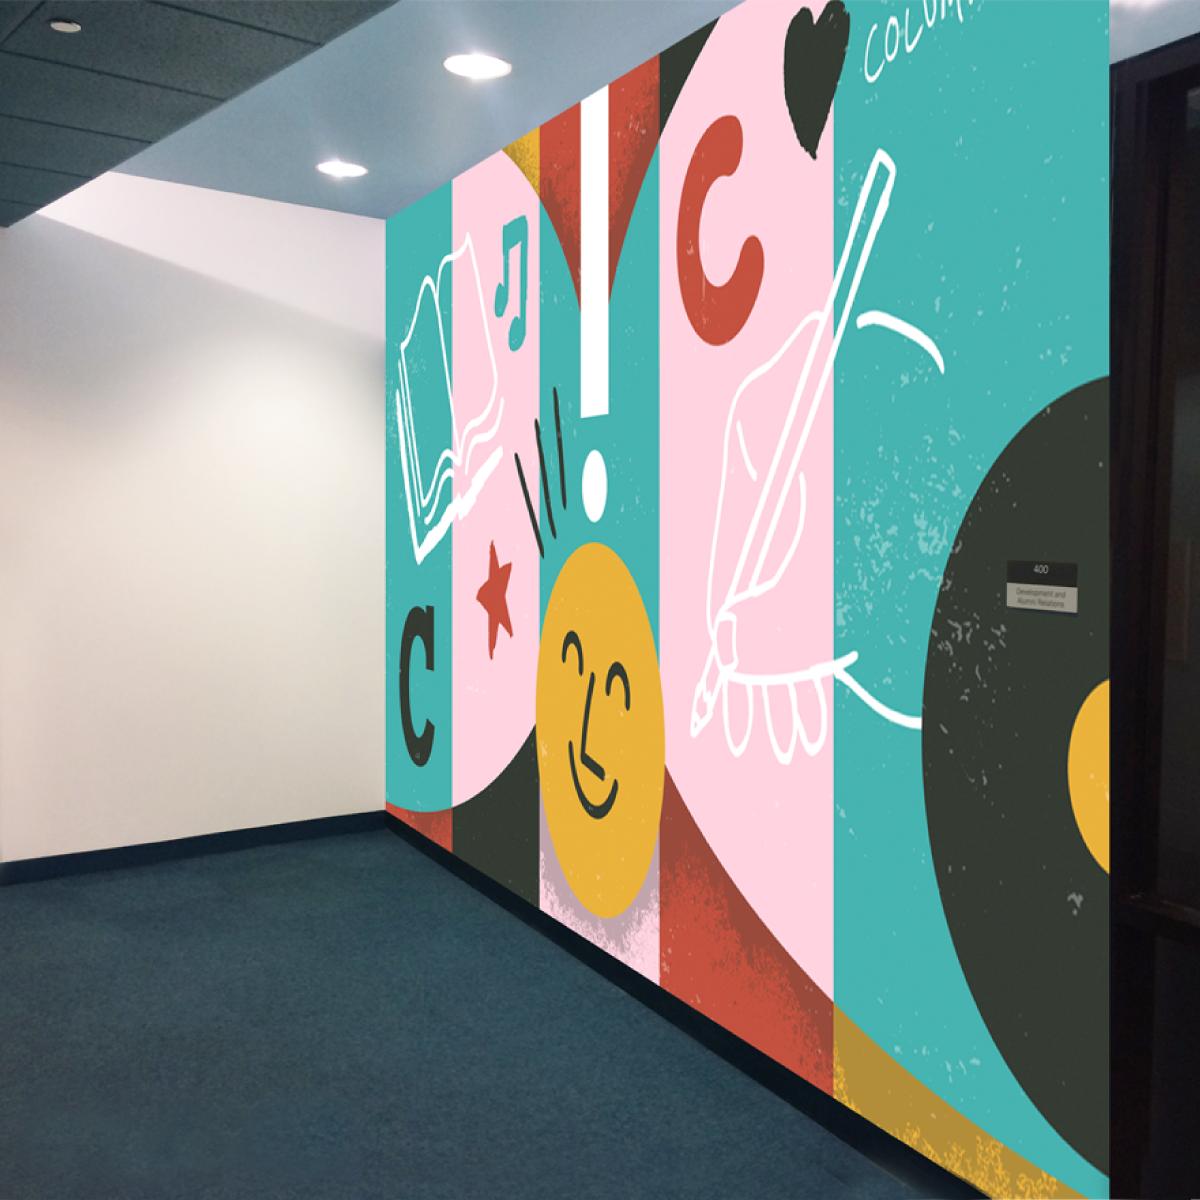 Development and Alumni Relations office interior mural concept